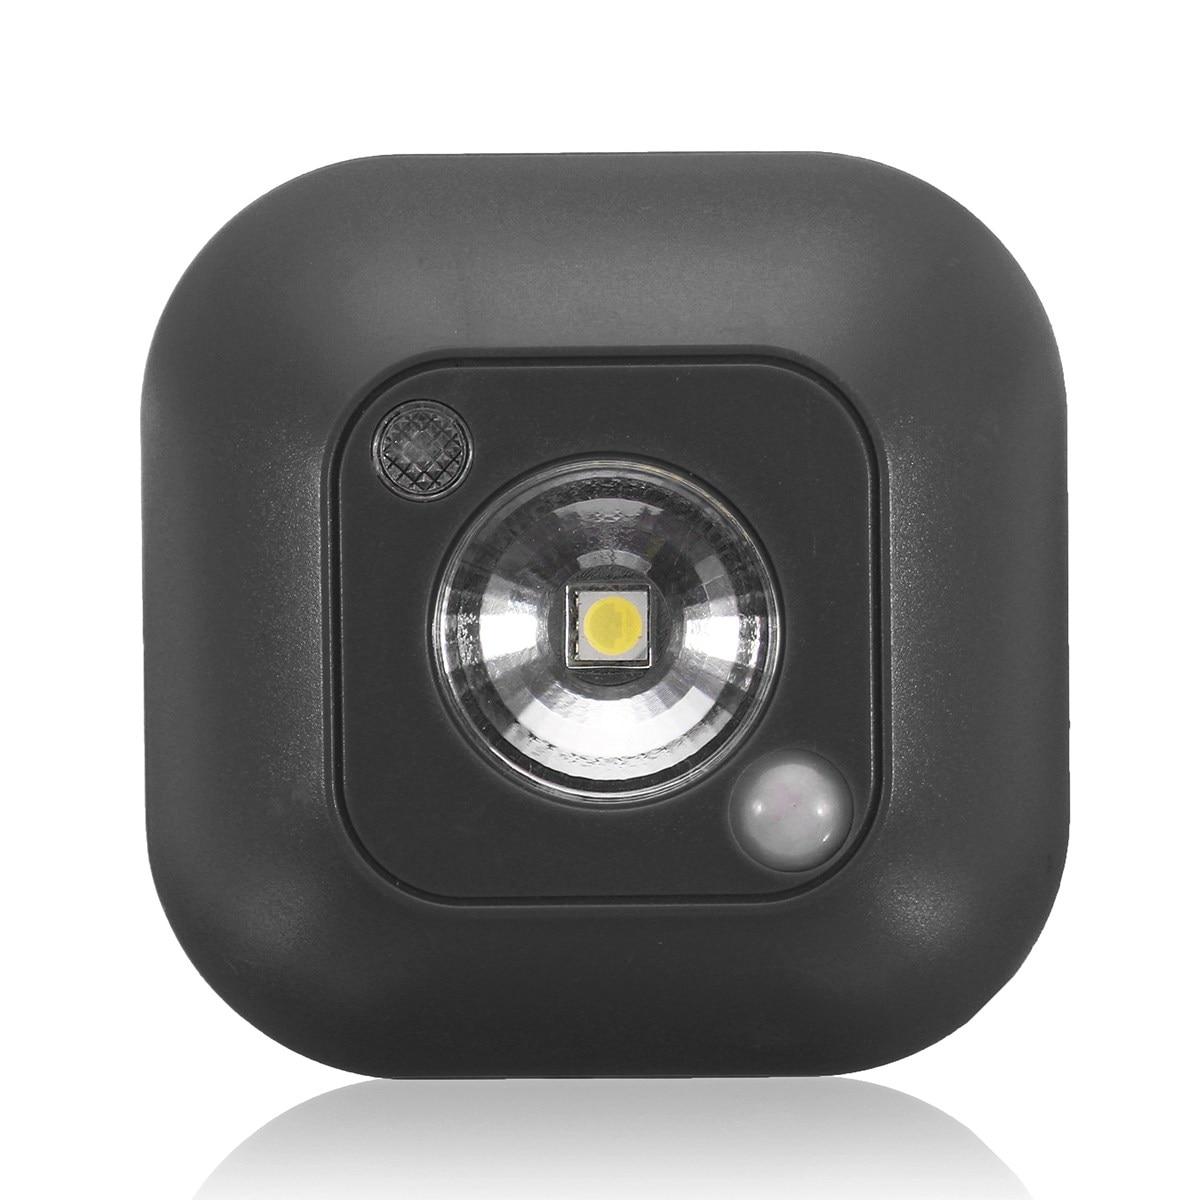 Square PIR Motion Sensor LED Light Control Emergency Night Light Ceiling Mini Wall Lamp Closet Cabinet Hallway Energy Saving